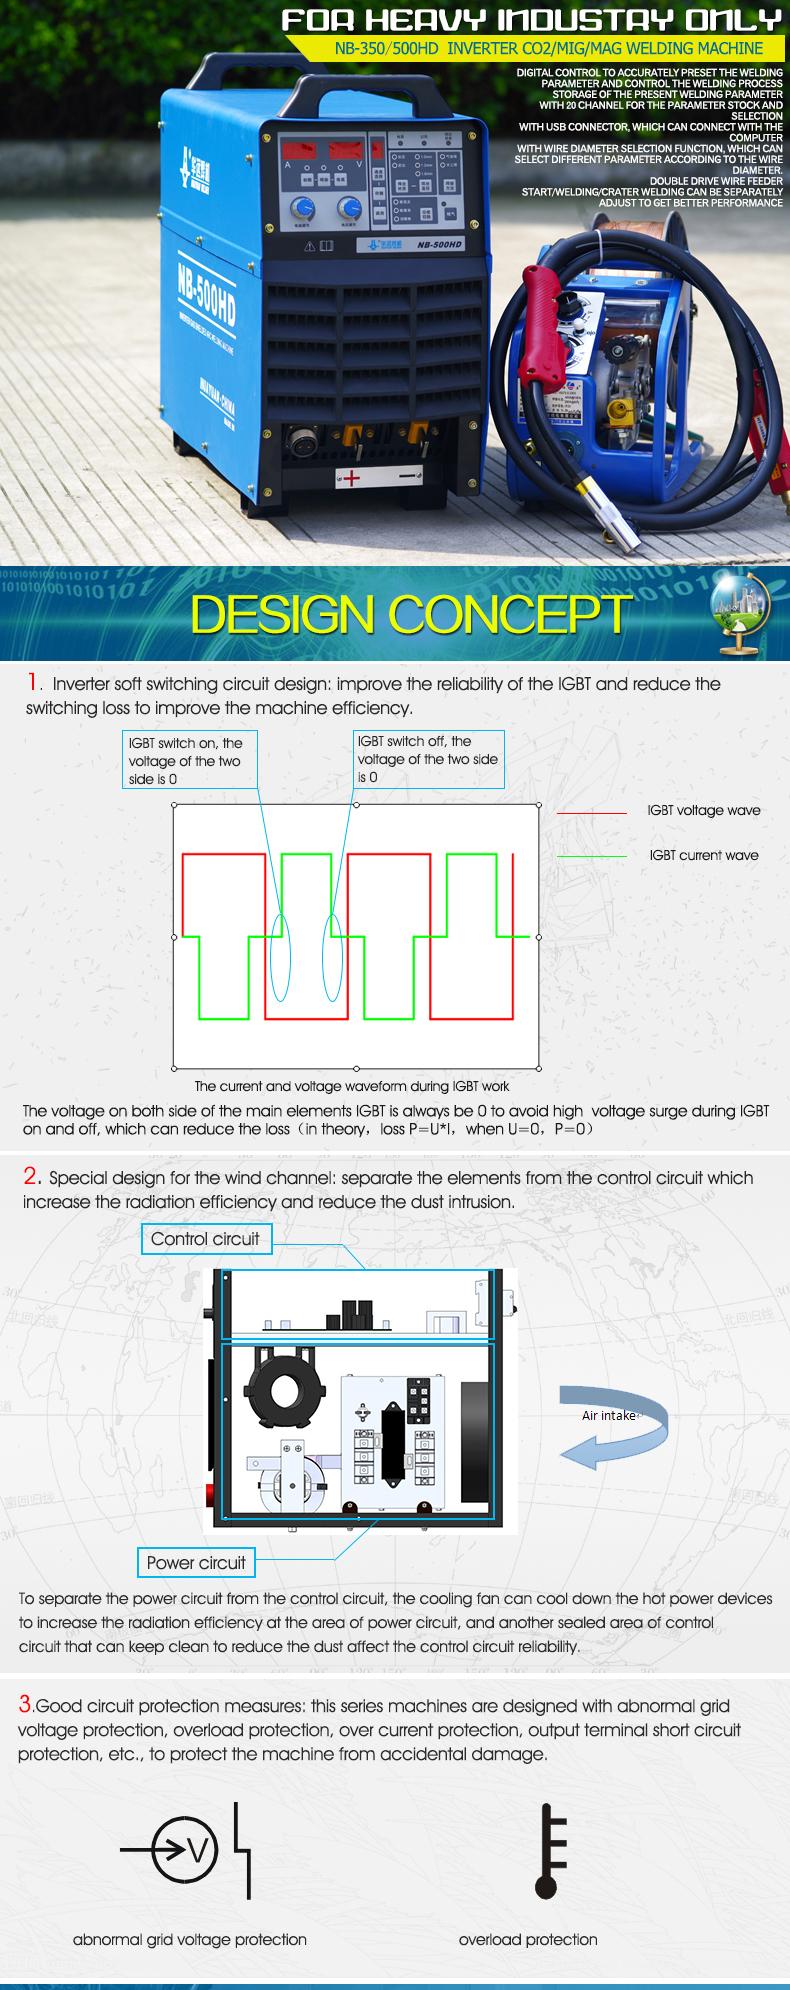 hight resolution of nb 500hd inverter co2 mag mig welding machine